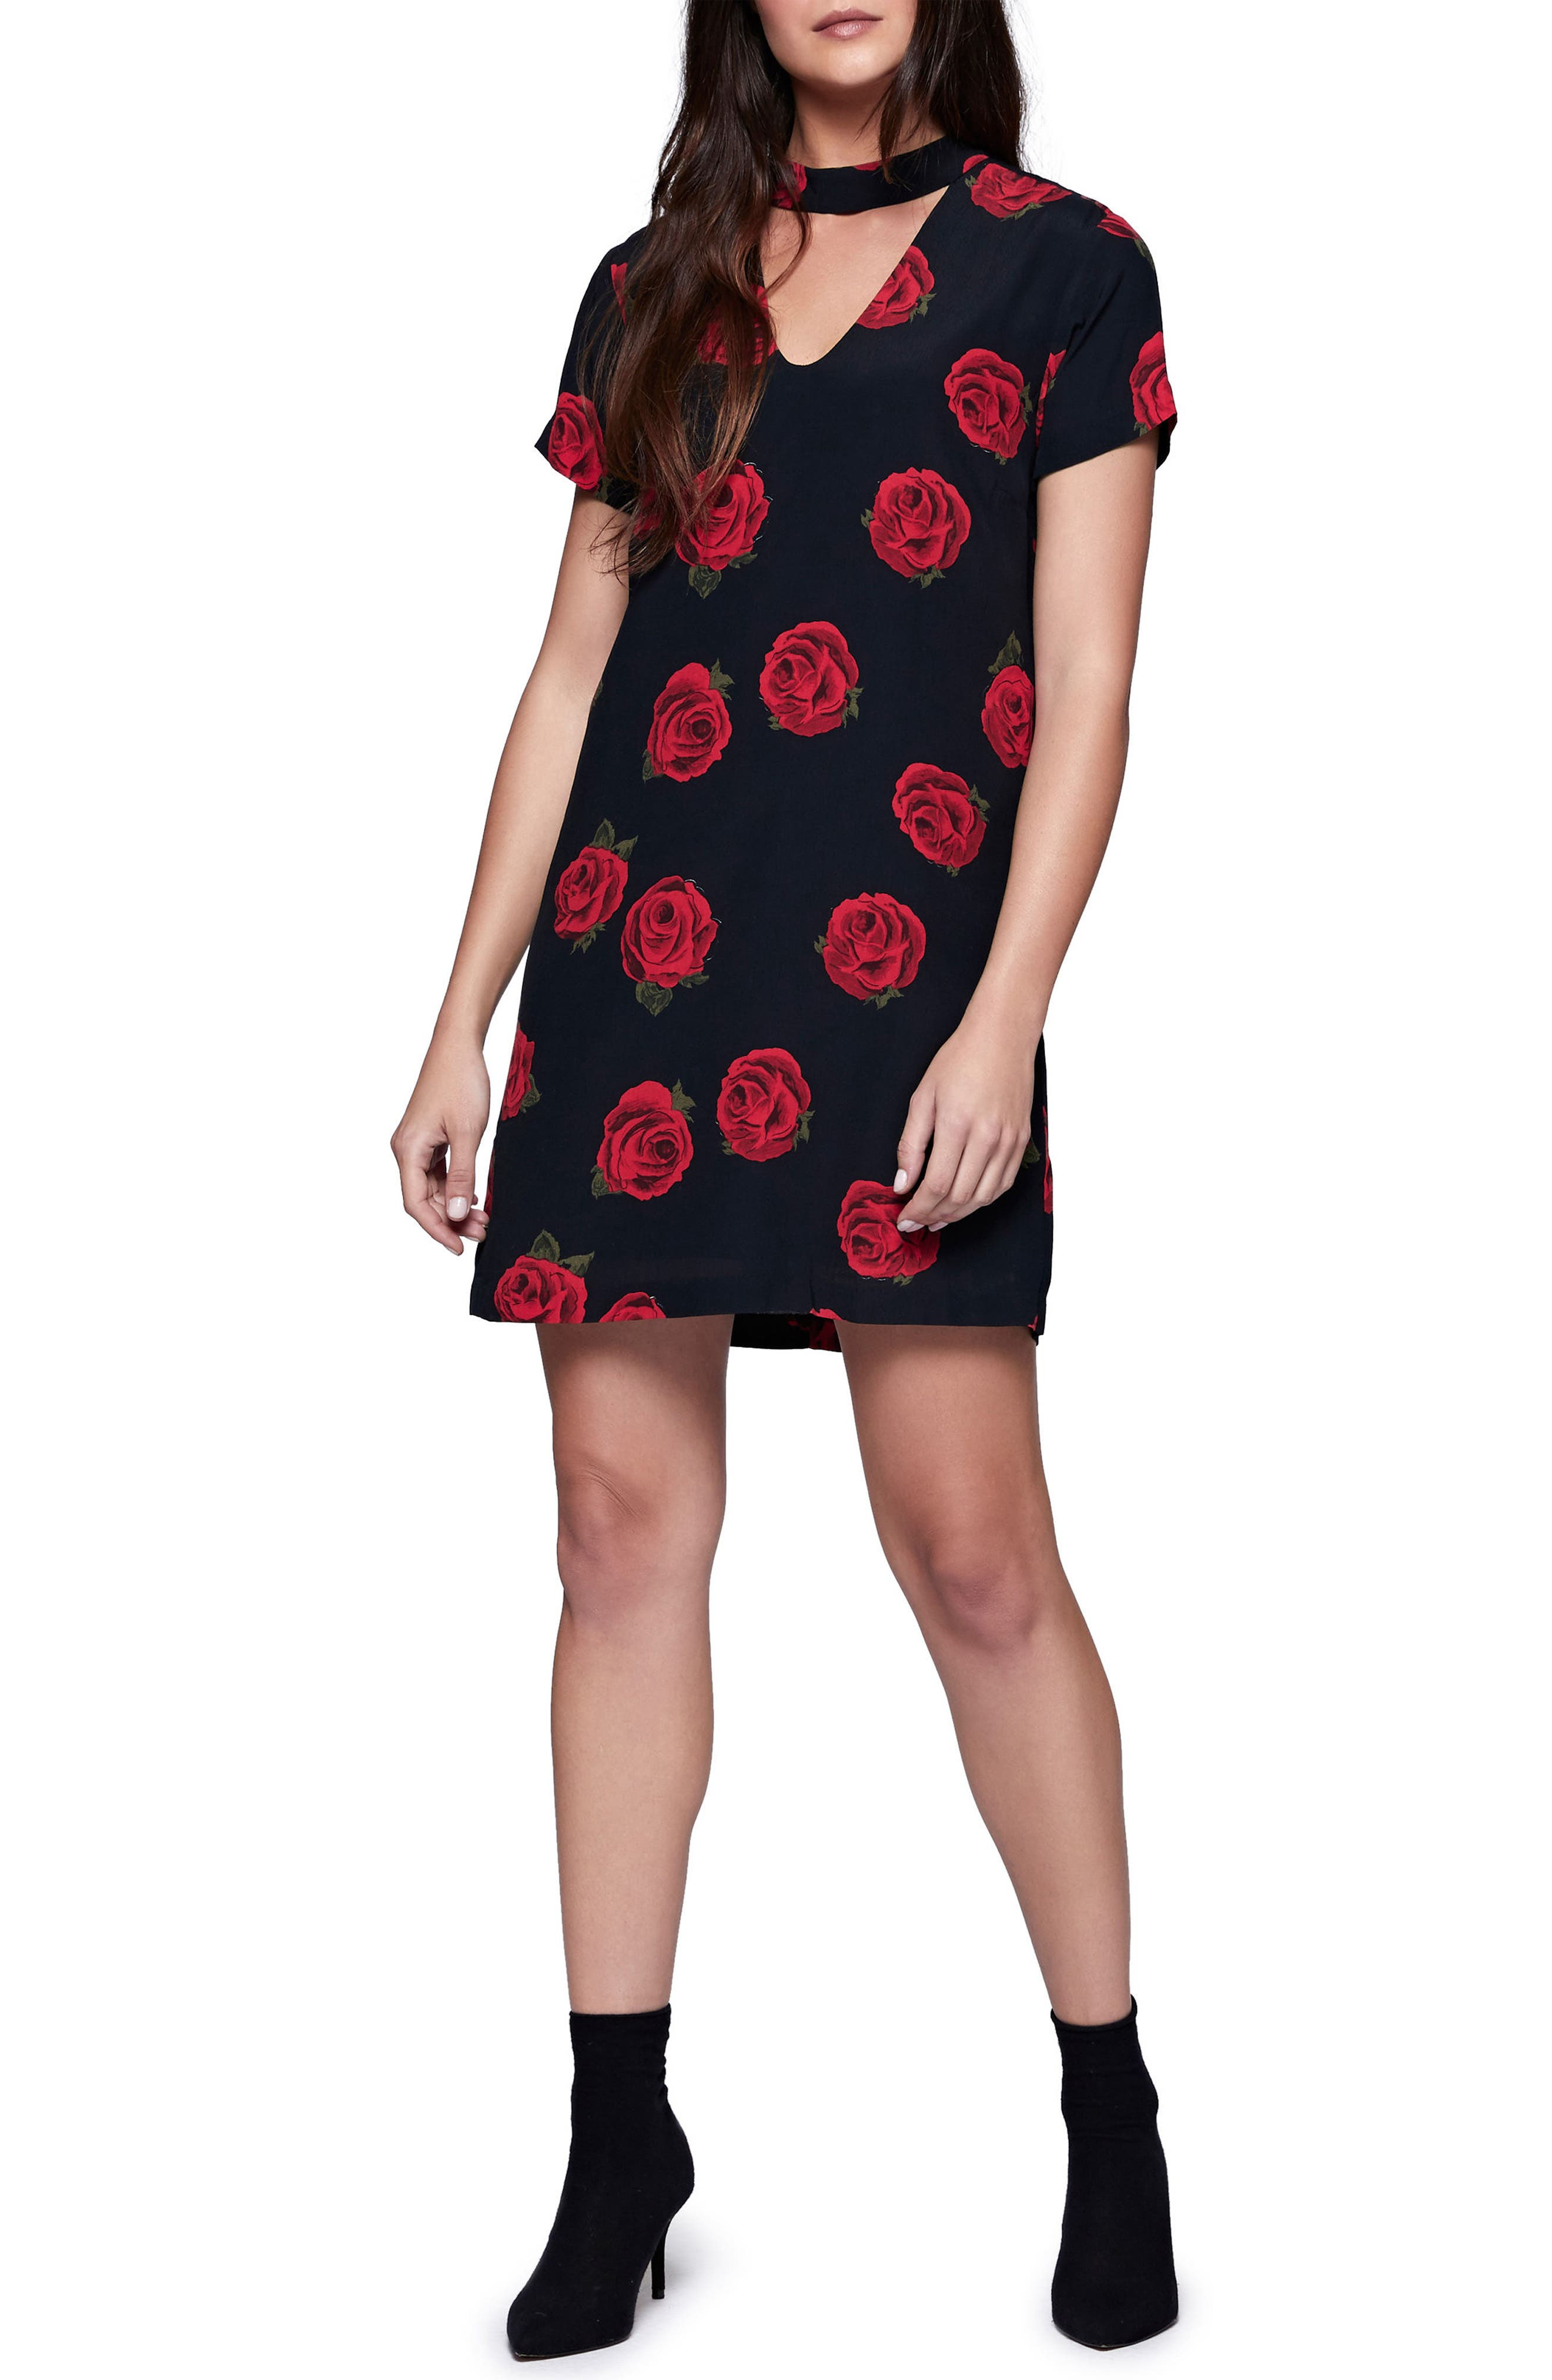 Madeline Choker Dress,                         Main,                         color, Paris Rose Black